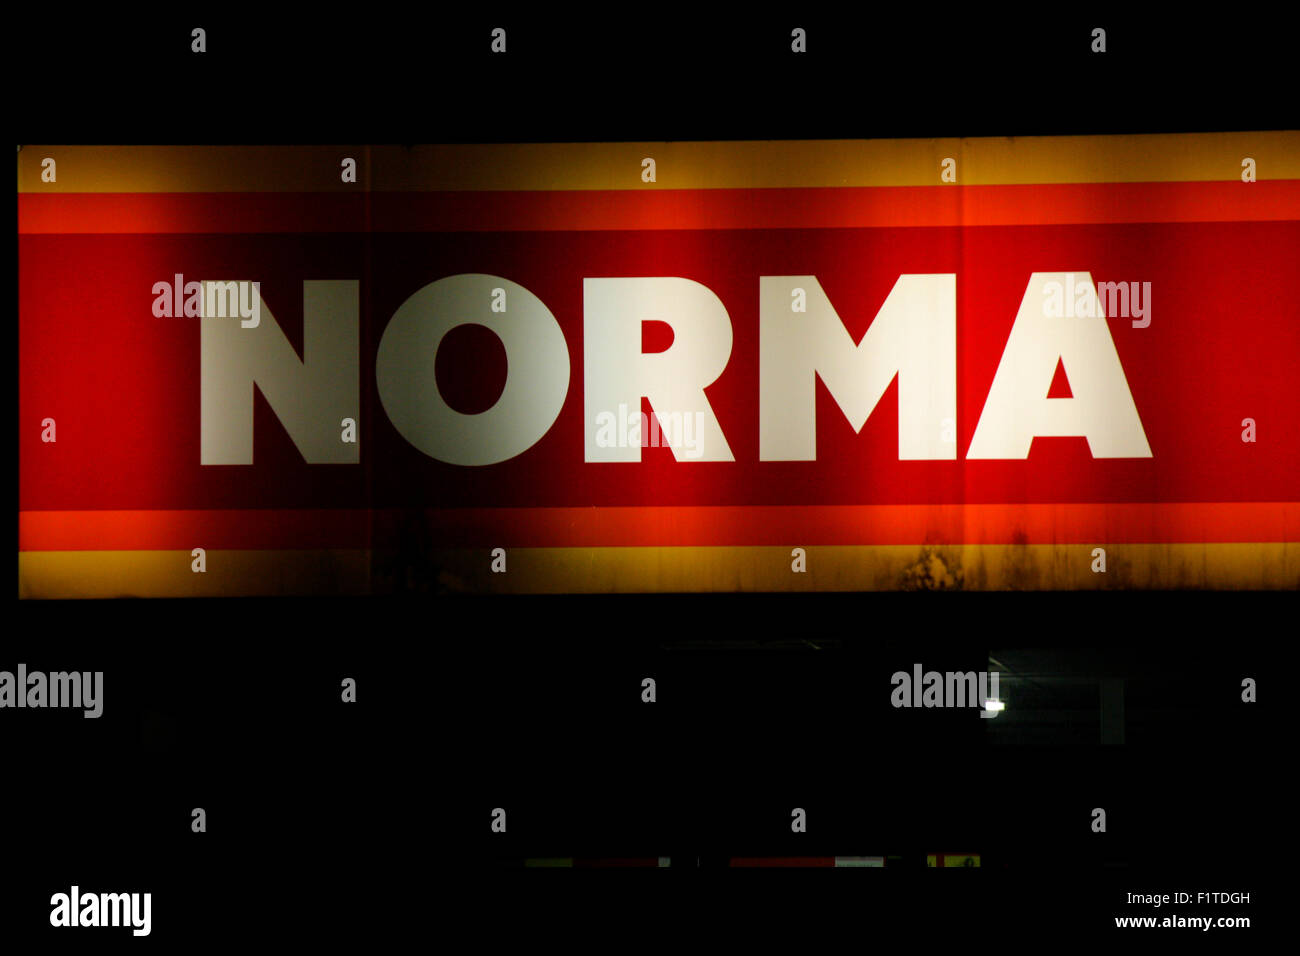 Markenname: 'Norma', November 2013, Berlin. - Stock Image